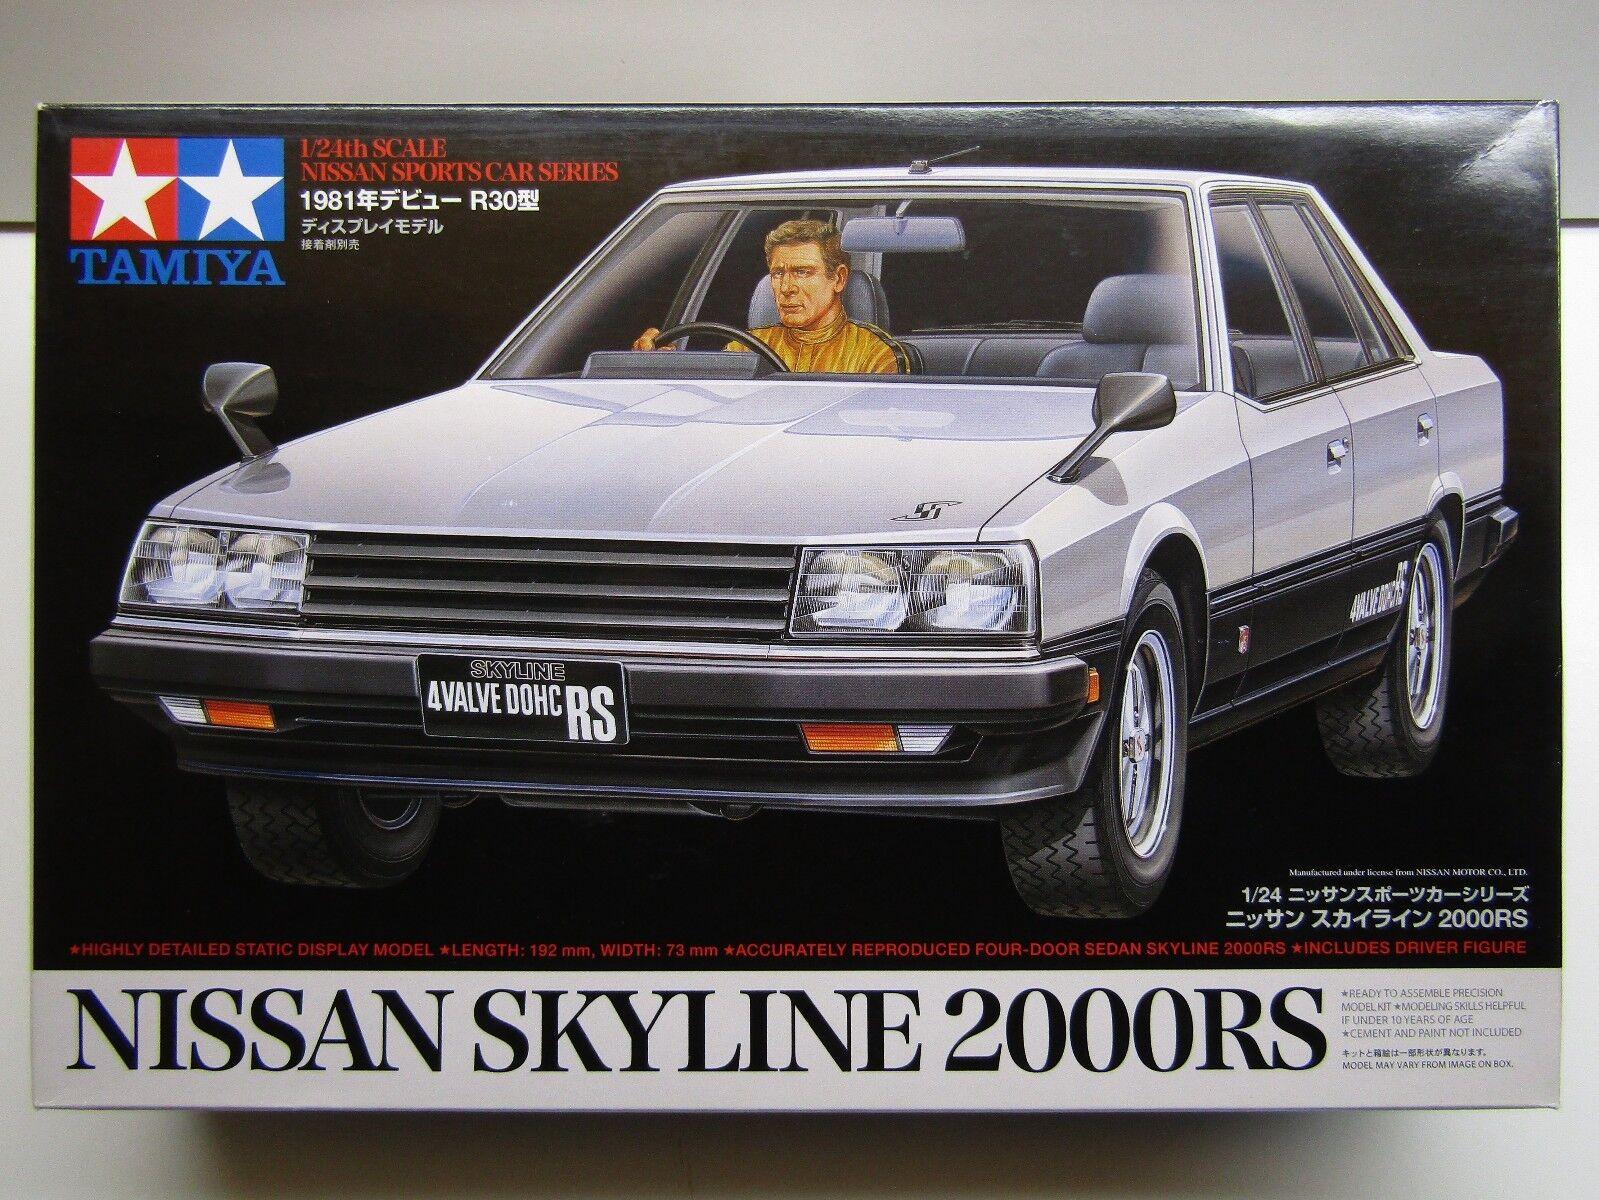 Tamiya 1 24 Scale Nissan Skyline 2000RS 4 Door Model Kit - New - 2200